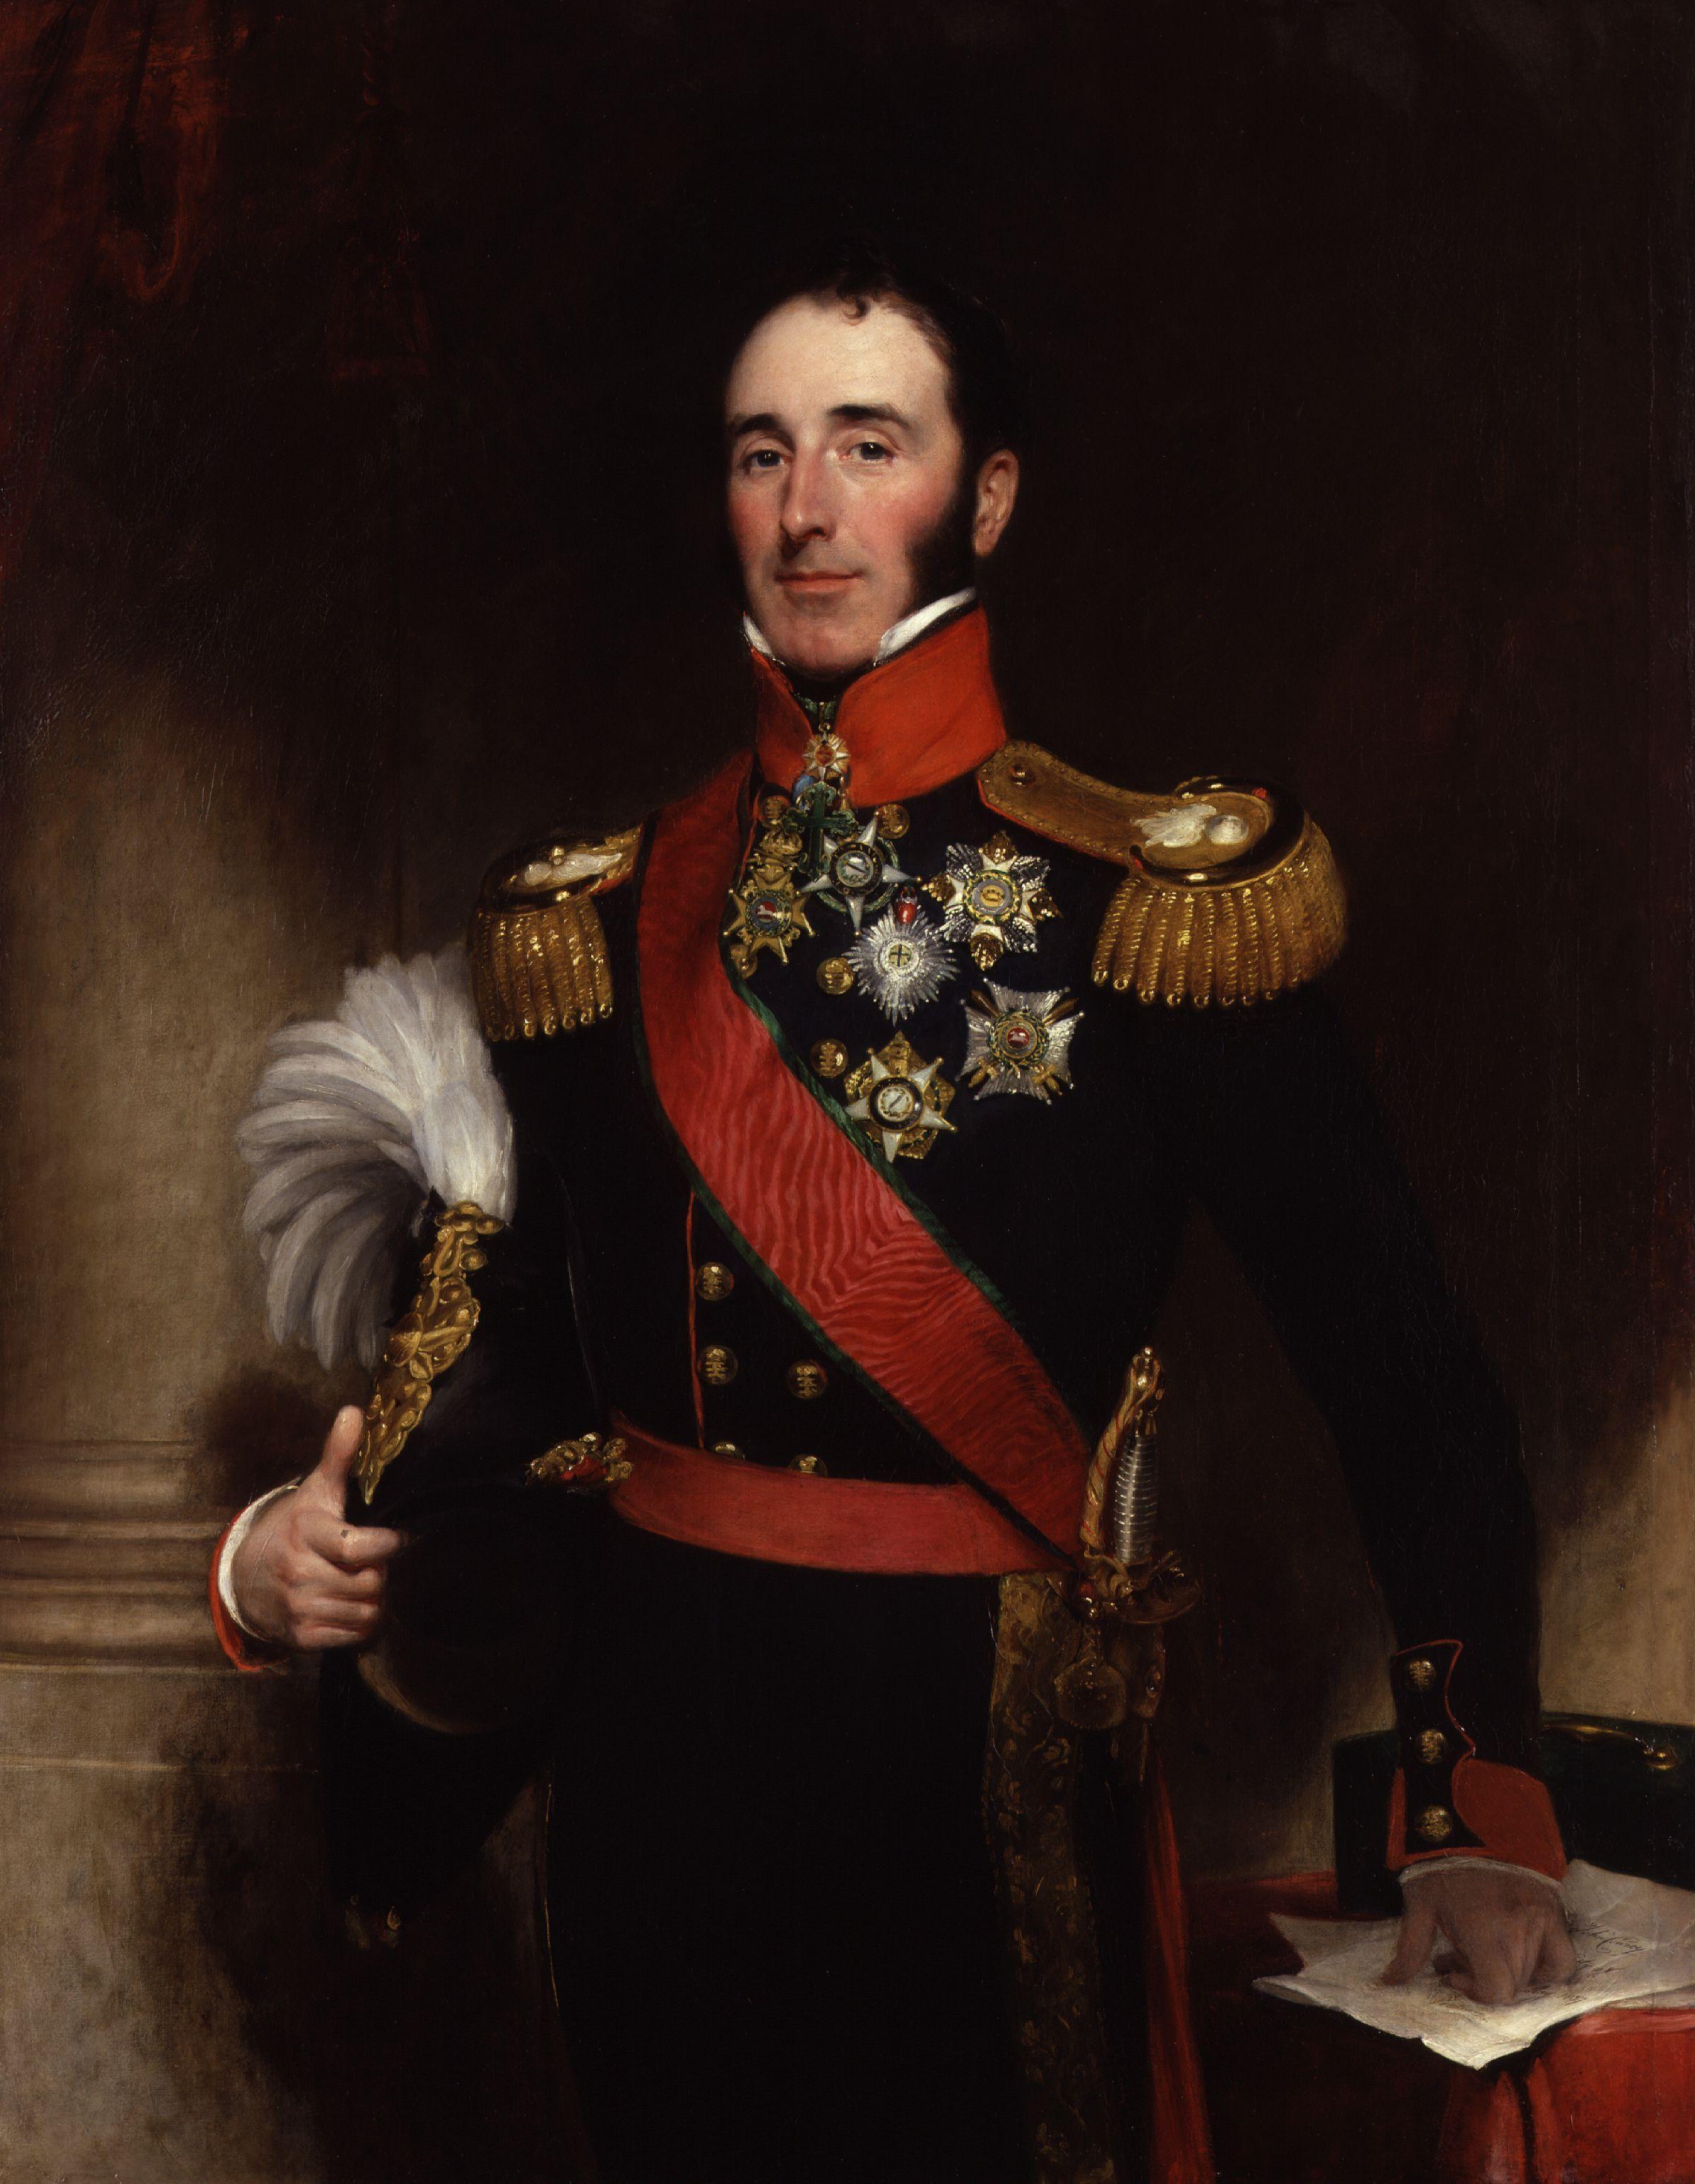 https://upload.wikimedia.org/wikipedia/commons/f/f6/Sir_John_Conroy%2C_1st_Bt_by_Henry_William_Pickersgill.jpg